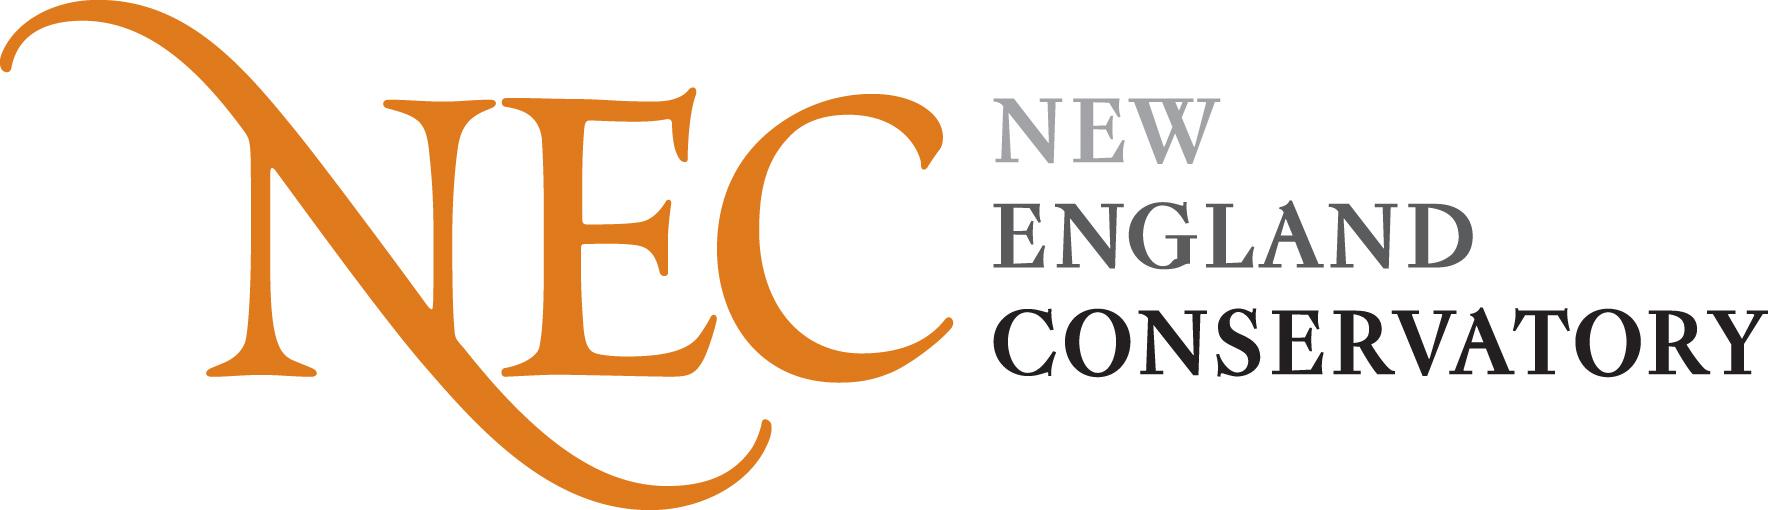 New English Conservatory